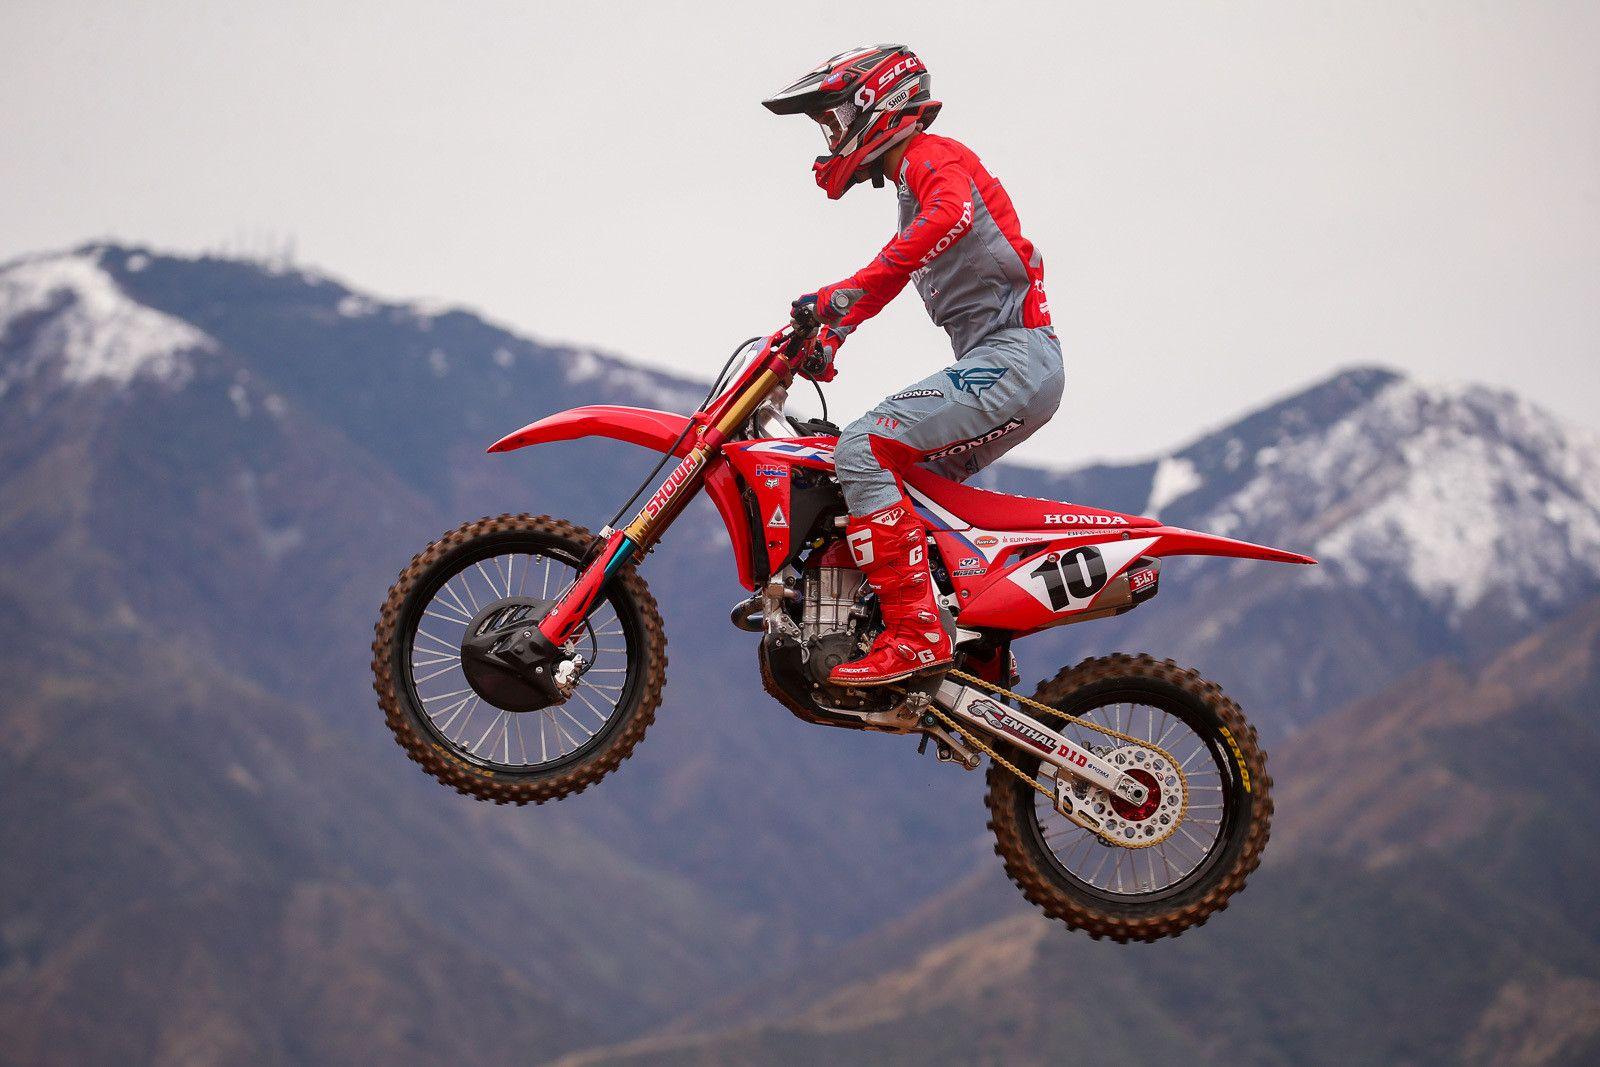 Seeing Red Honda 2020 Team Intro Motocross Feature Stories Vital Mx Motocross Honda Supercross Race